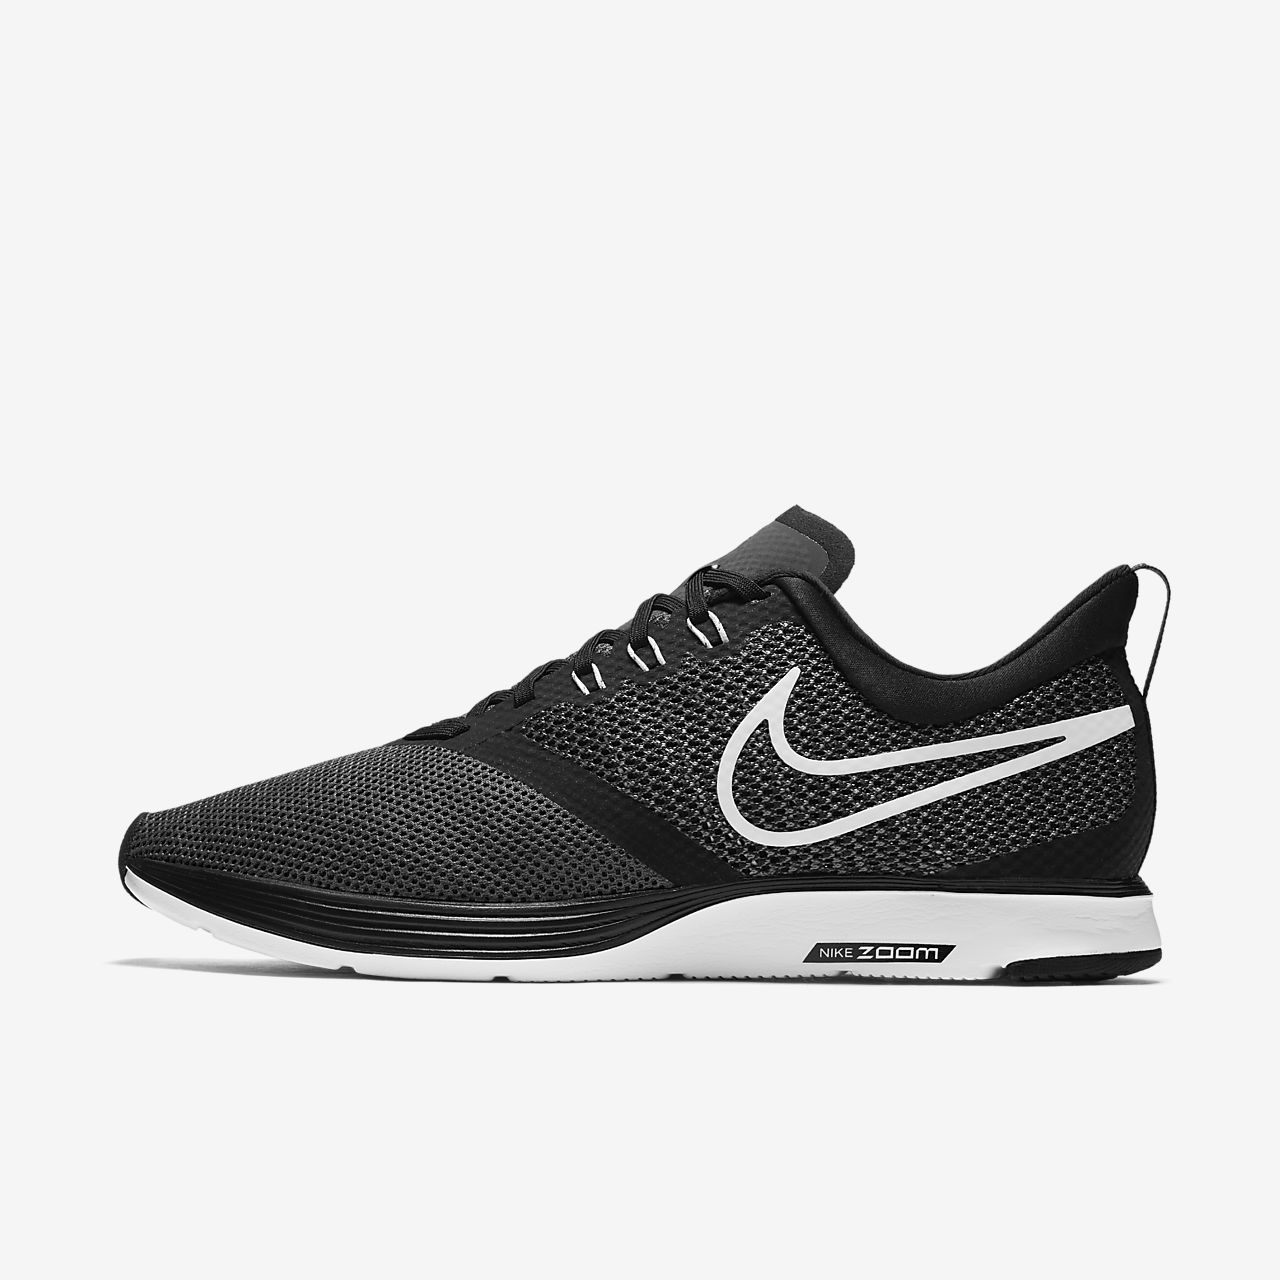 huge selection of 43190 d5d12 Nike Zoom Strike Men's Running Shoe